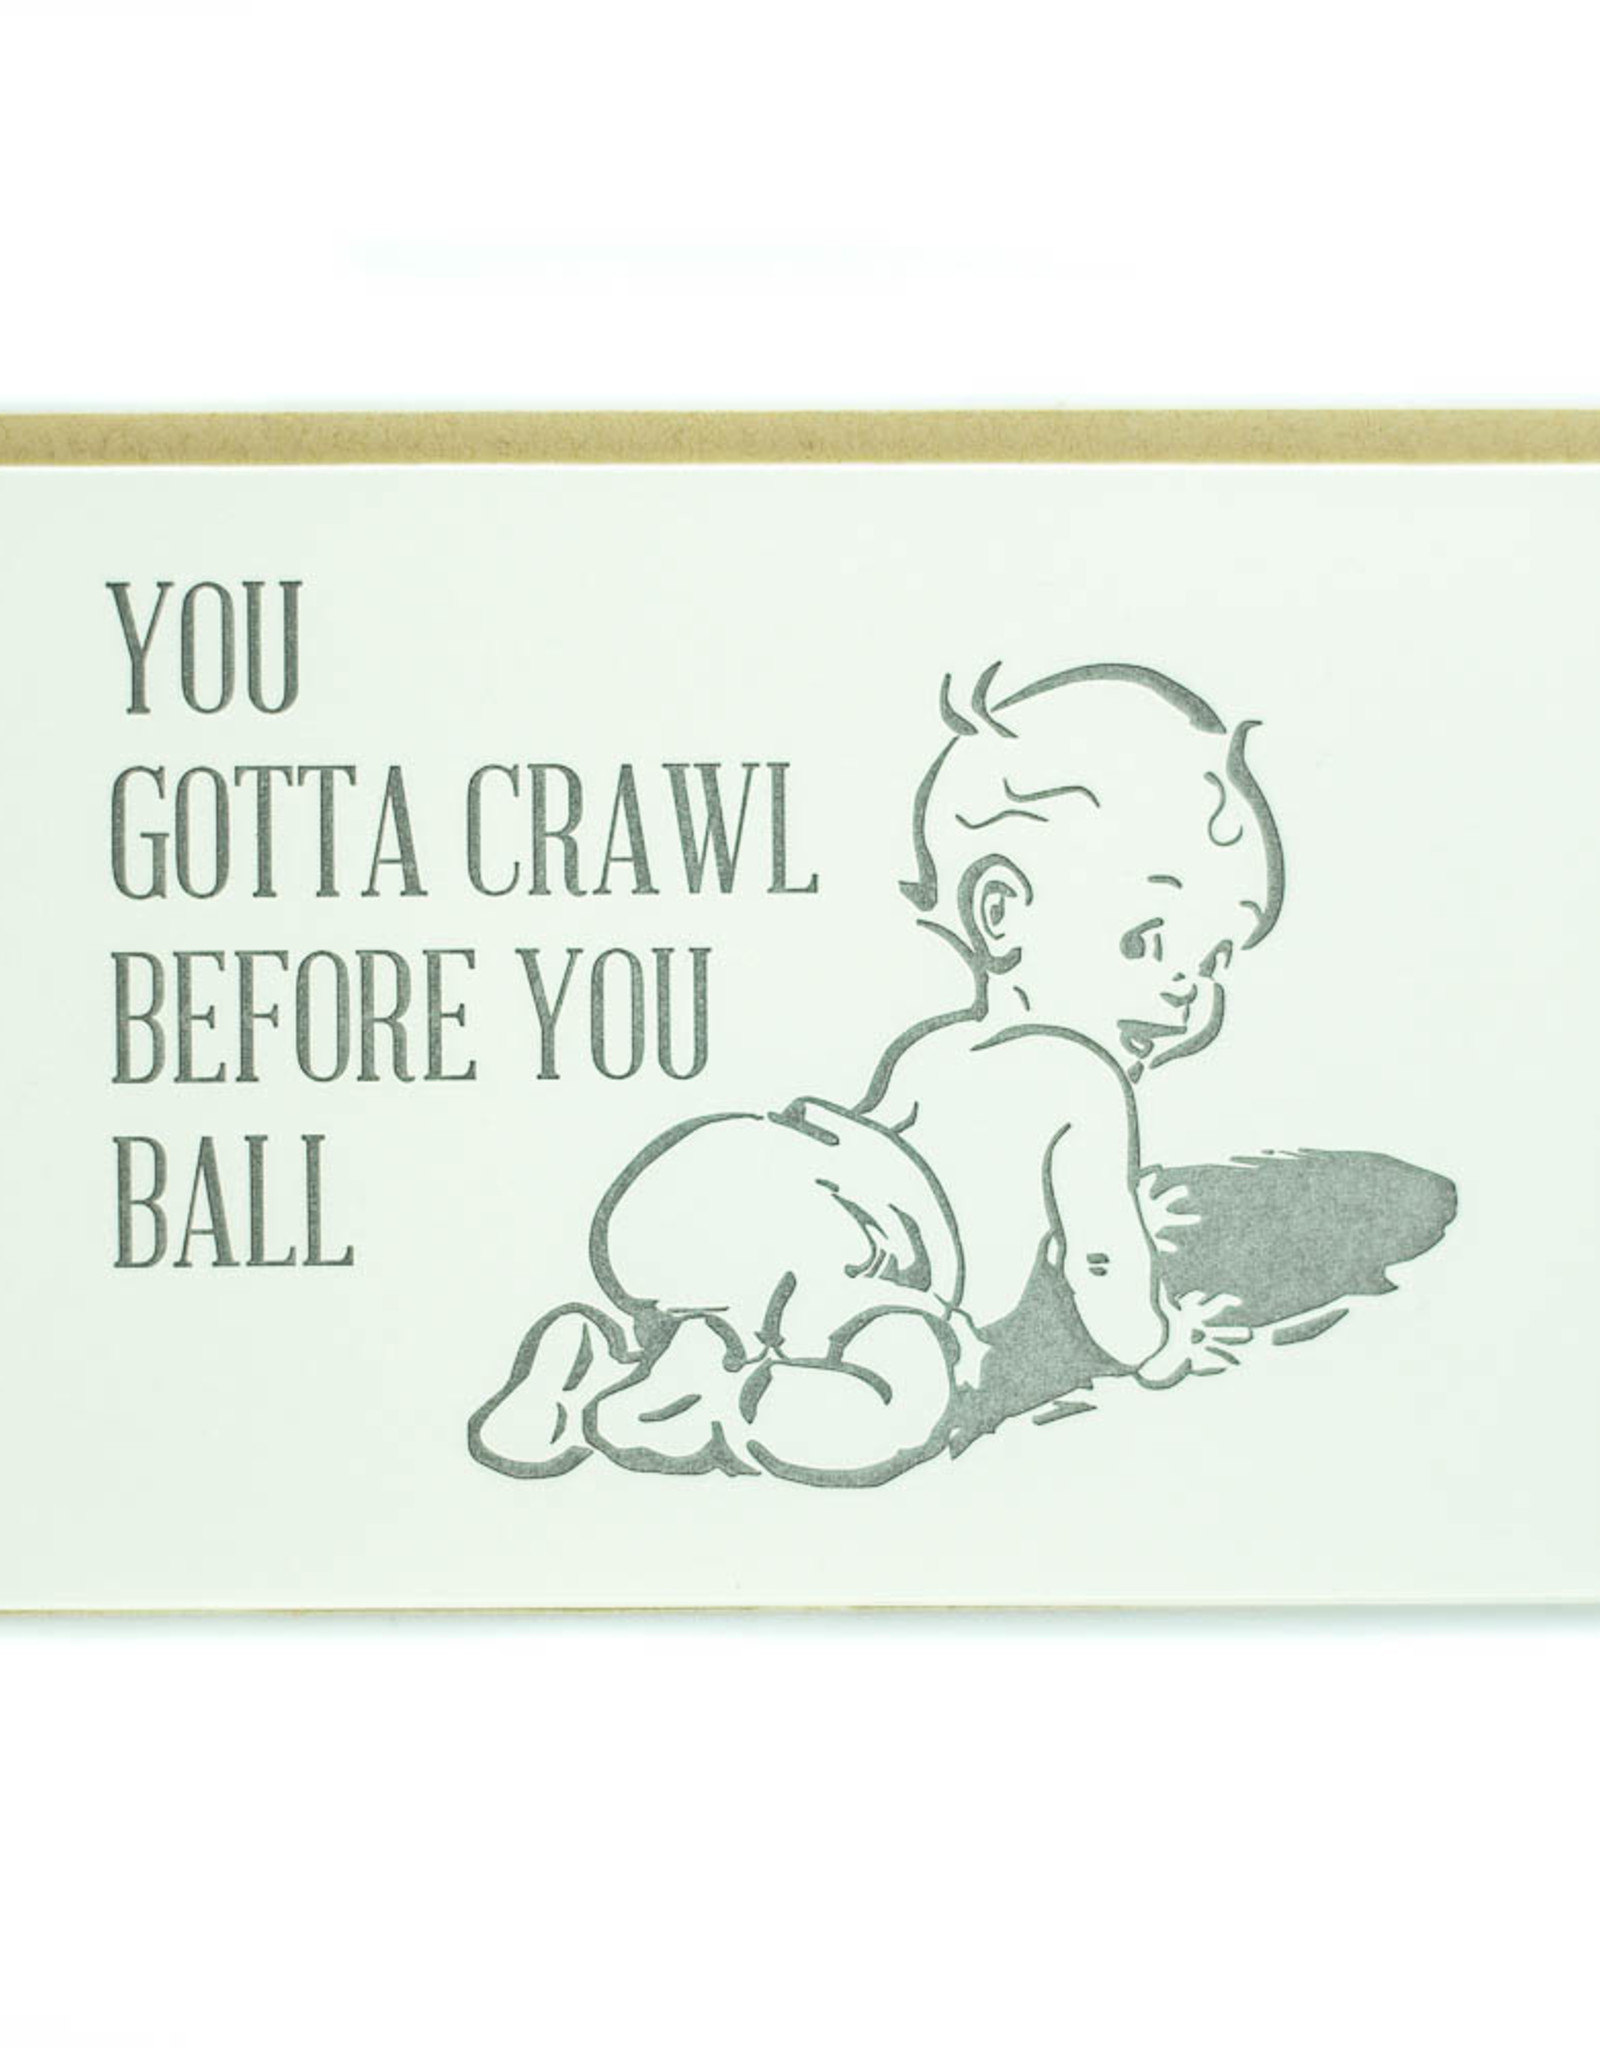 Crawl Before You Ball Greeting Card